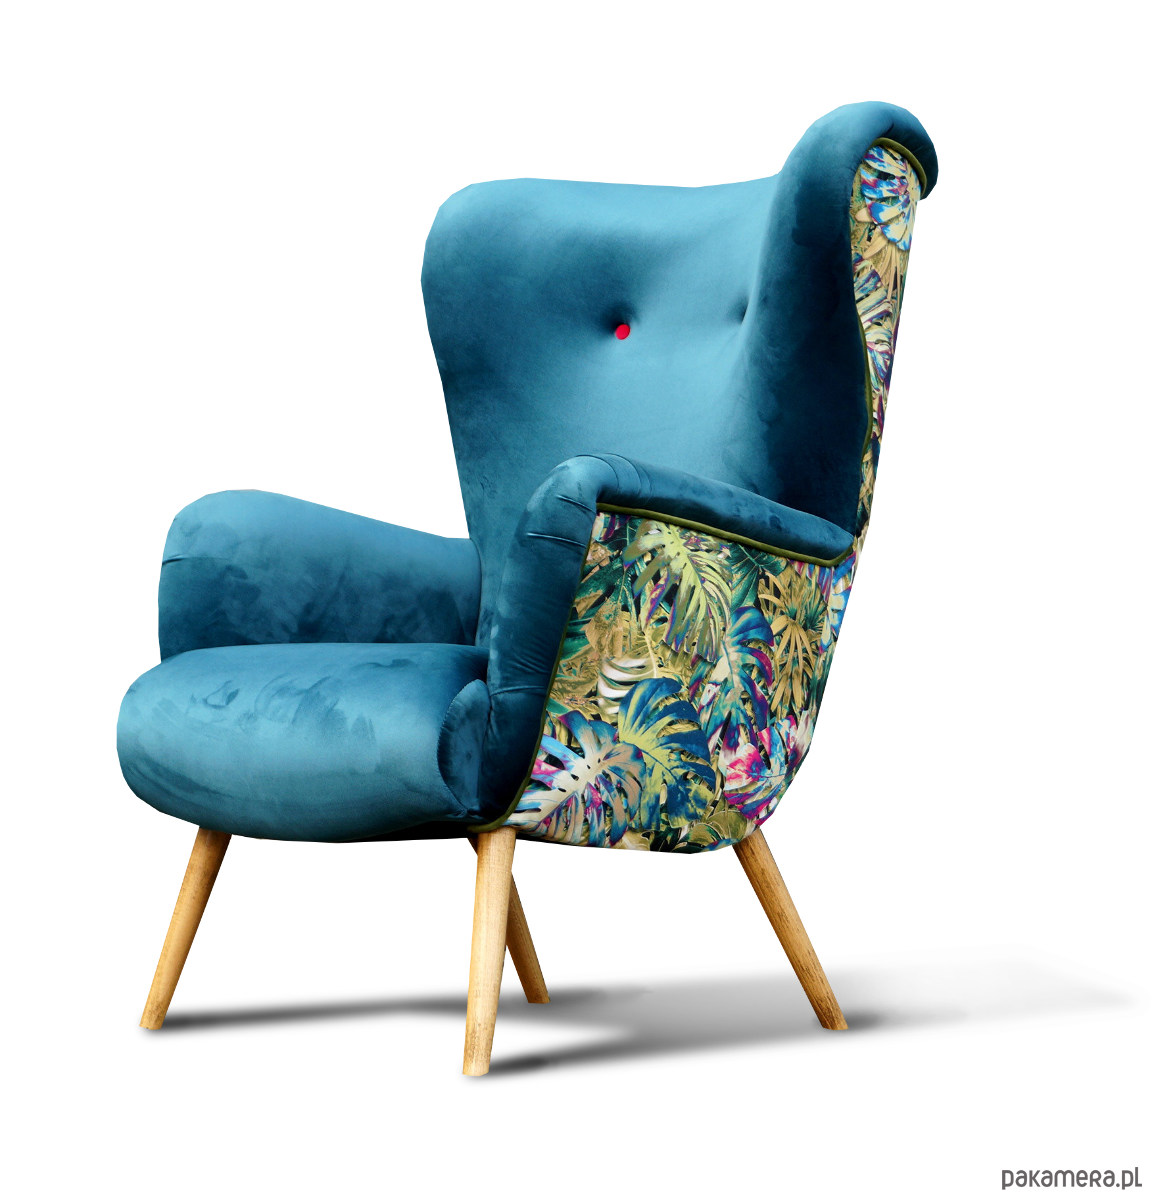 Fotel Uszak Skandynawski Nowoczesny Lata 50 Meble Fotele